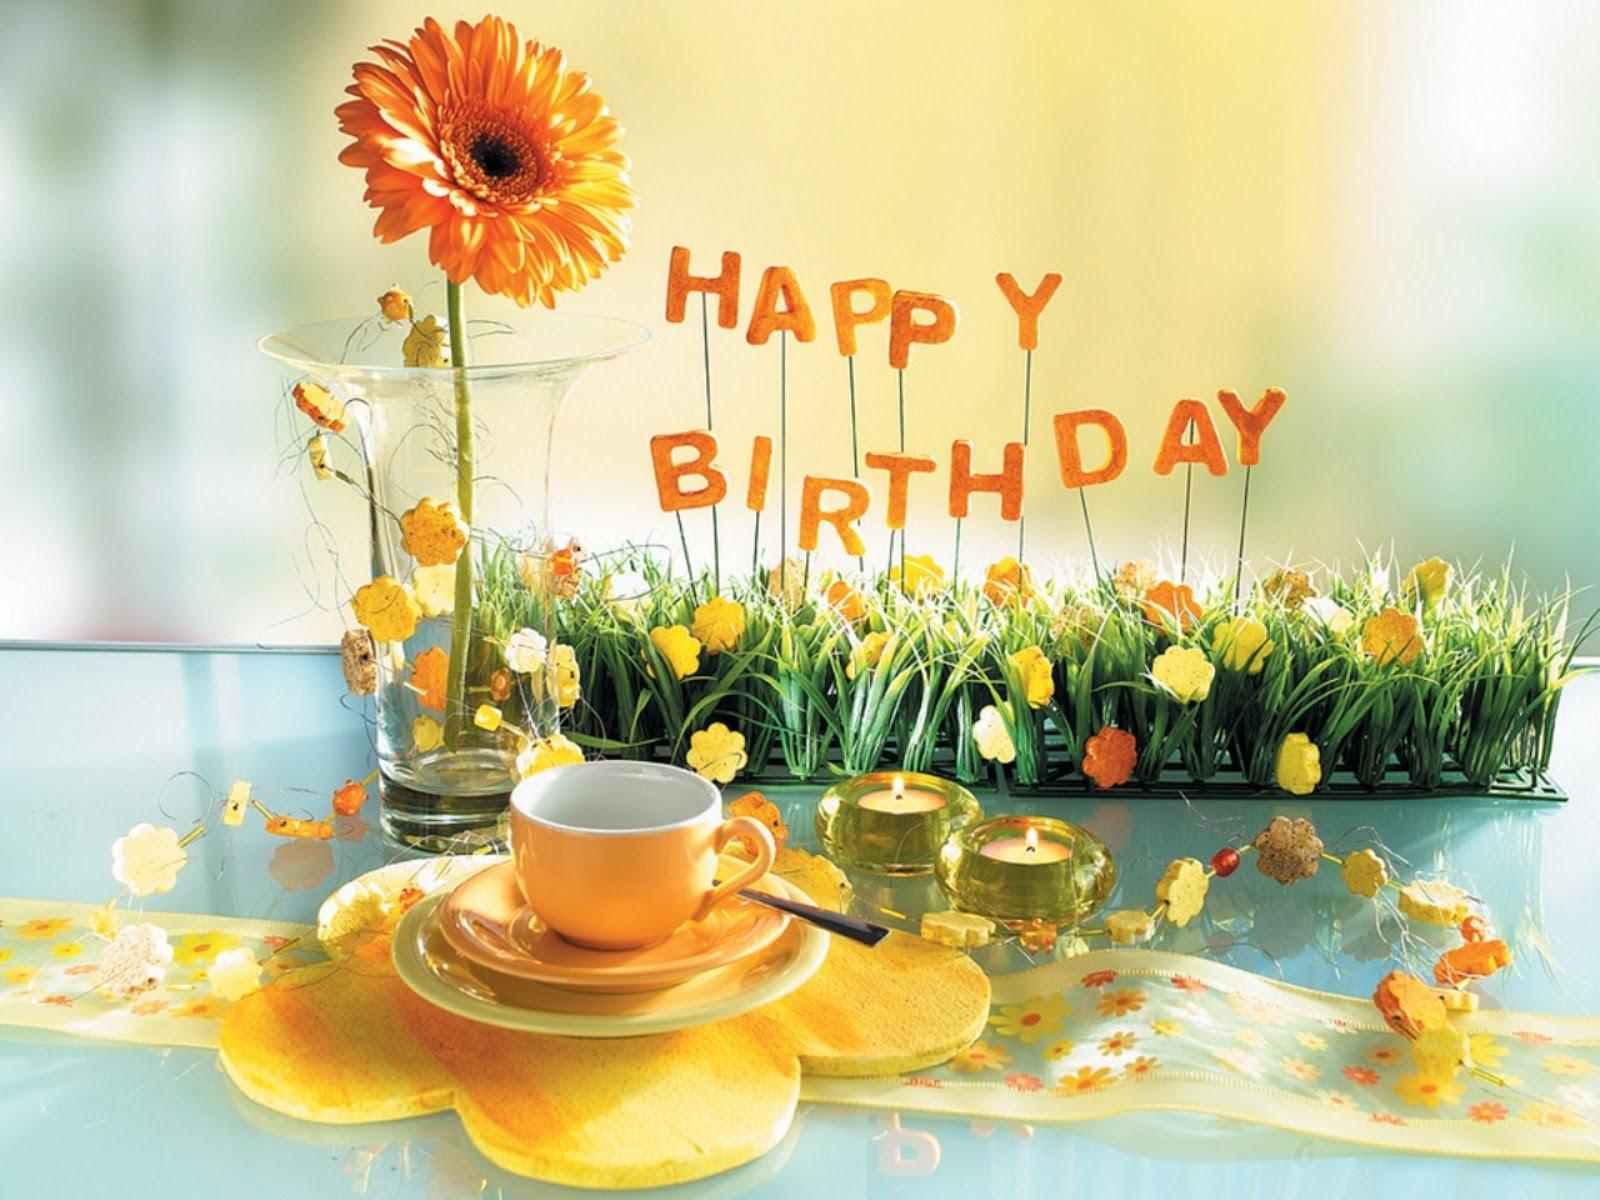 Wallpaper 4k Happy Birthday Images Tea 4k 4k Wallpapers Birthday Free Hd Hd Wallpapers Wallpapers